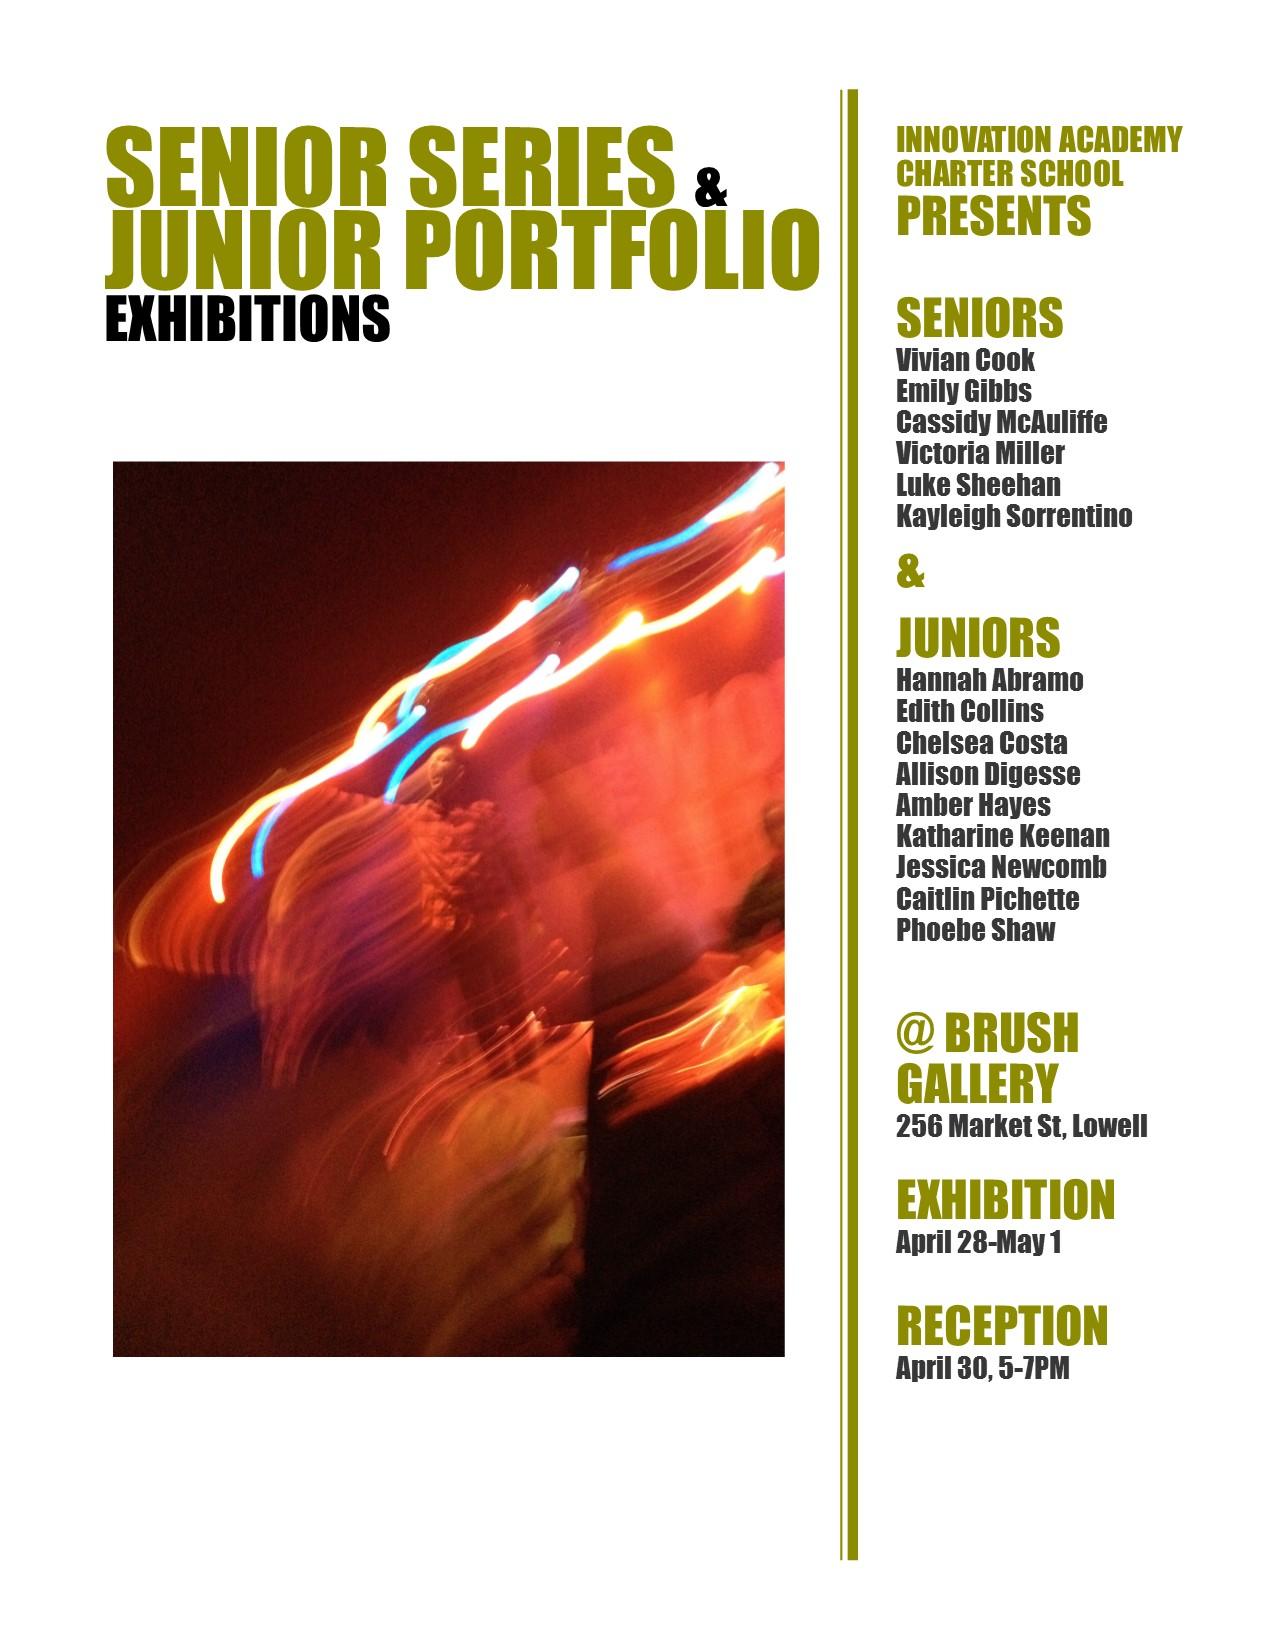 IACS Artists Present Senior Series and Junior Portfolio Exhibition